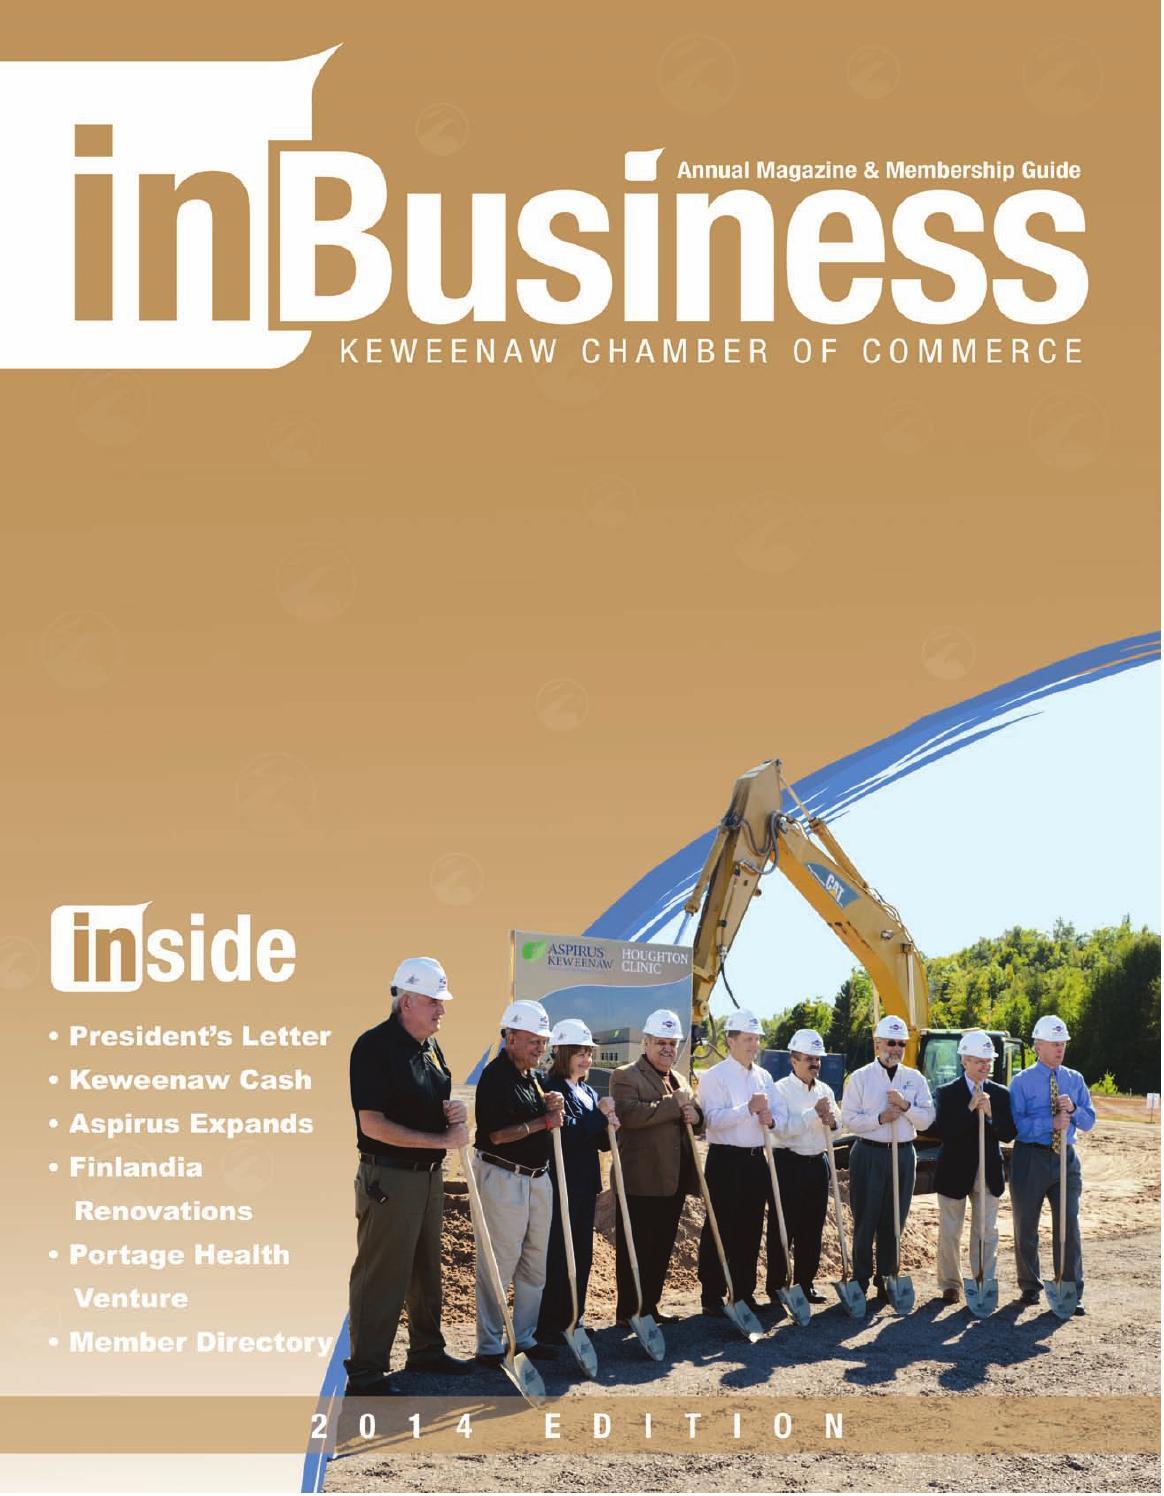 Michigan keweenaw county allouez - 2014 Keweenaw Chamber Inbusiness Magazine By Keweenaw Chamber Of Commerce Issuu